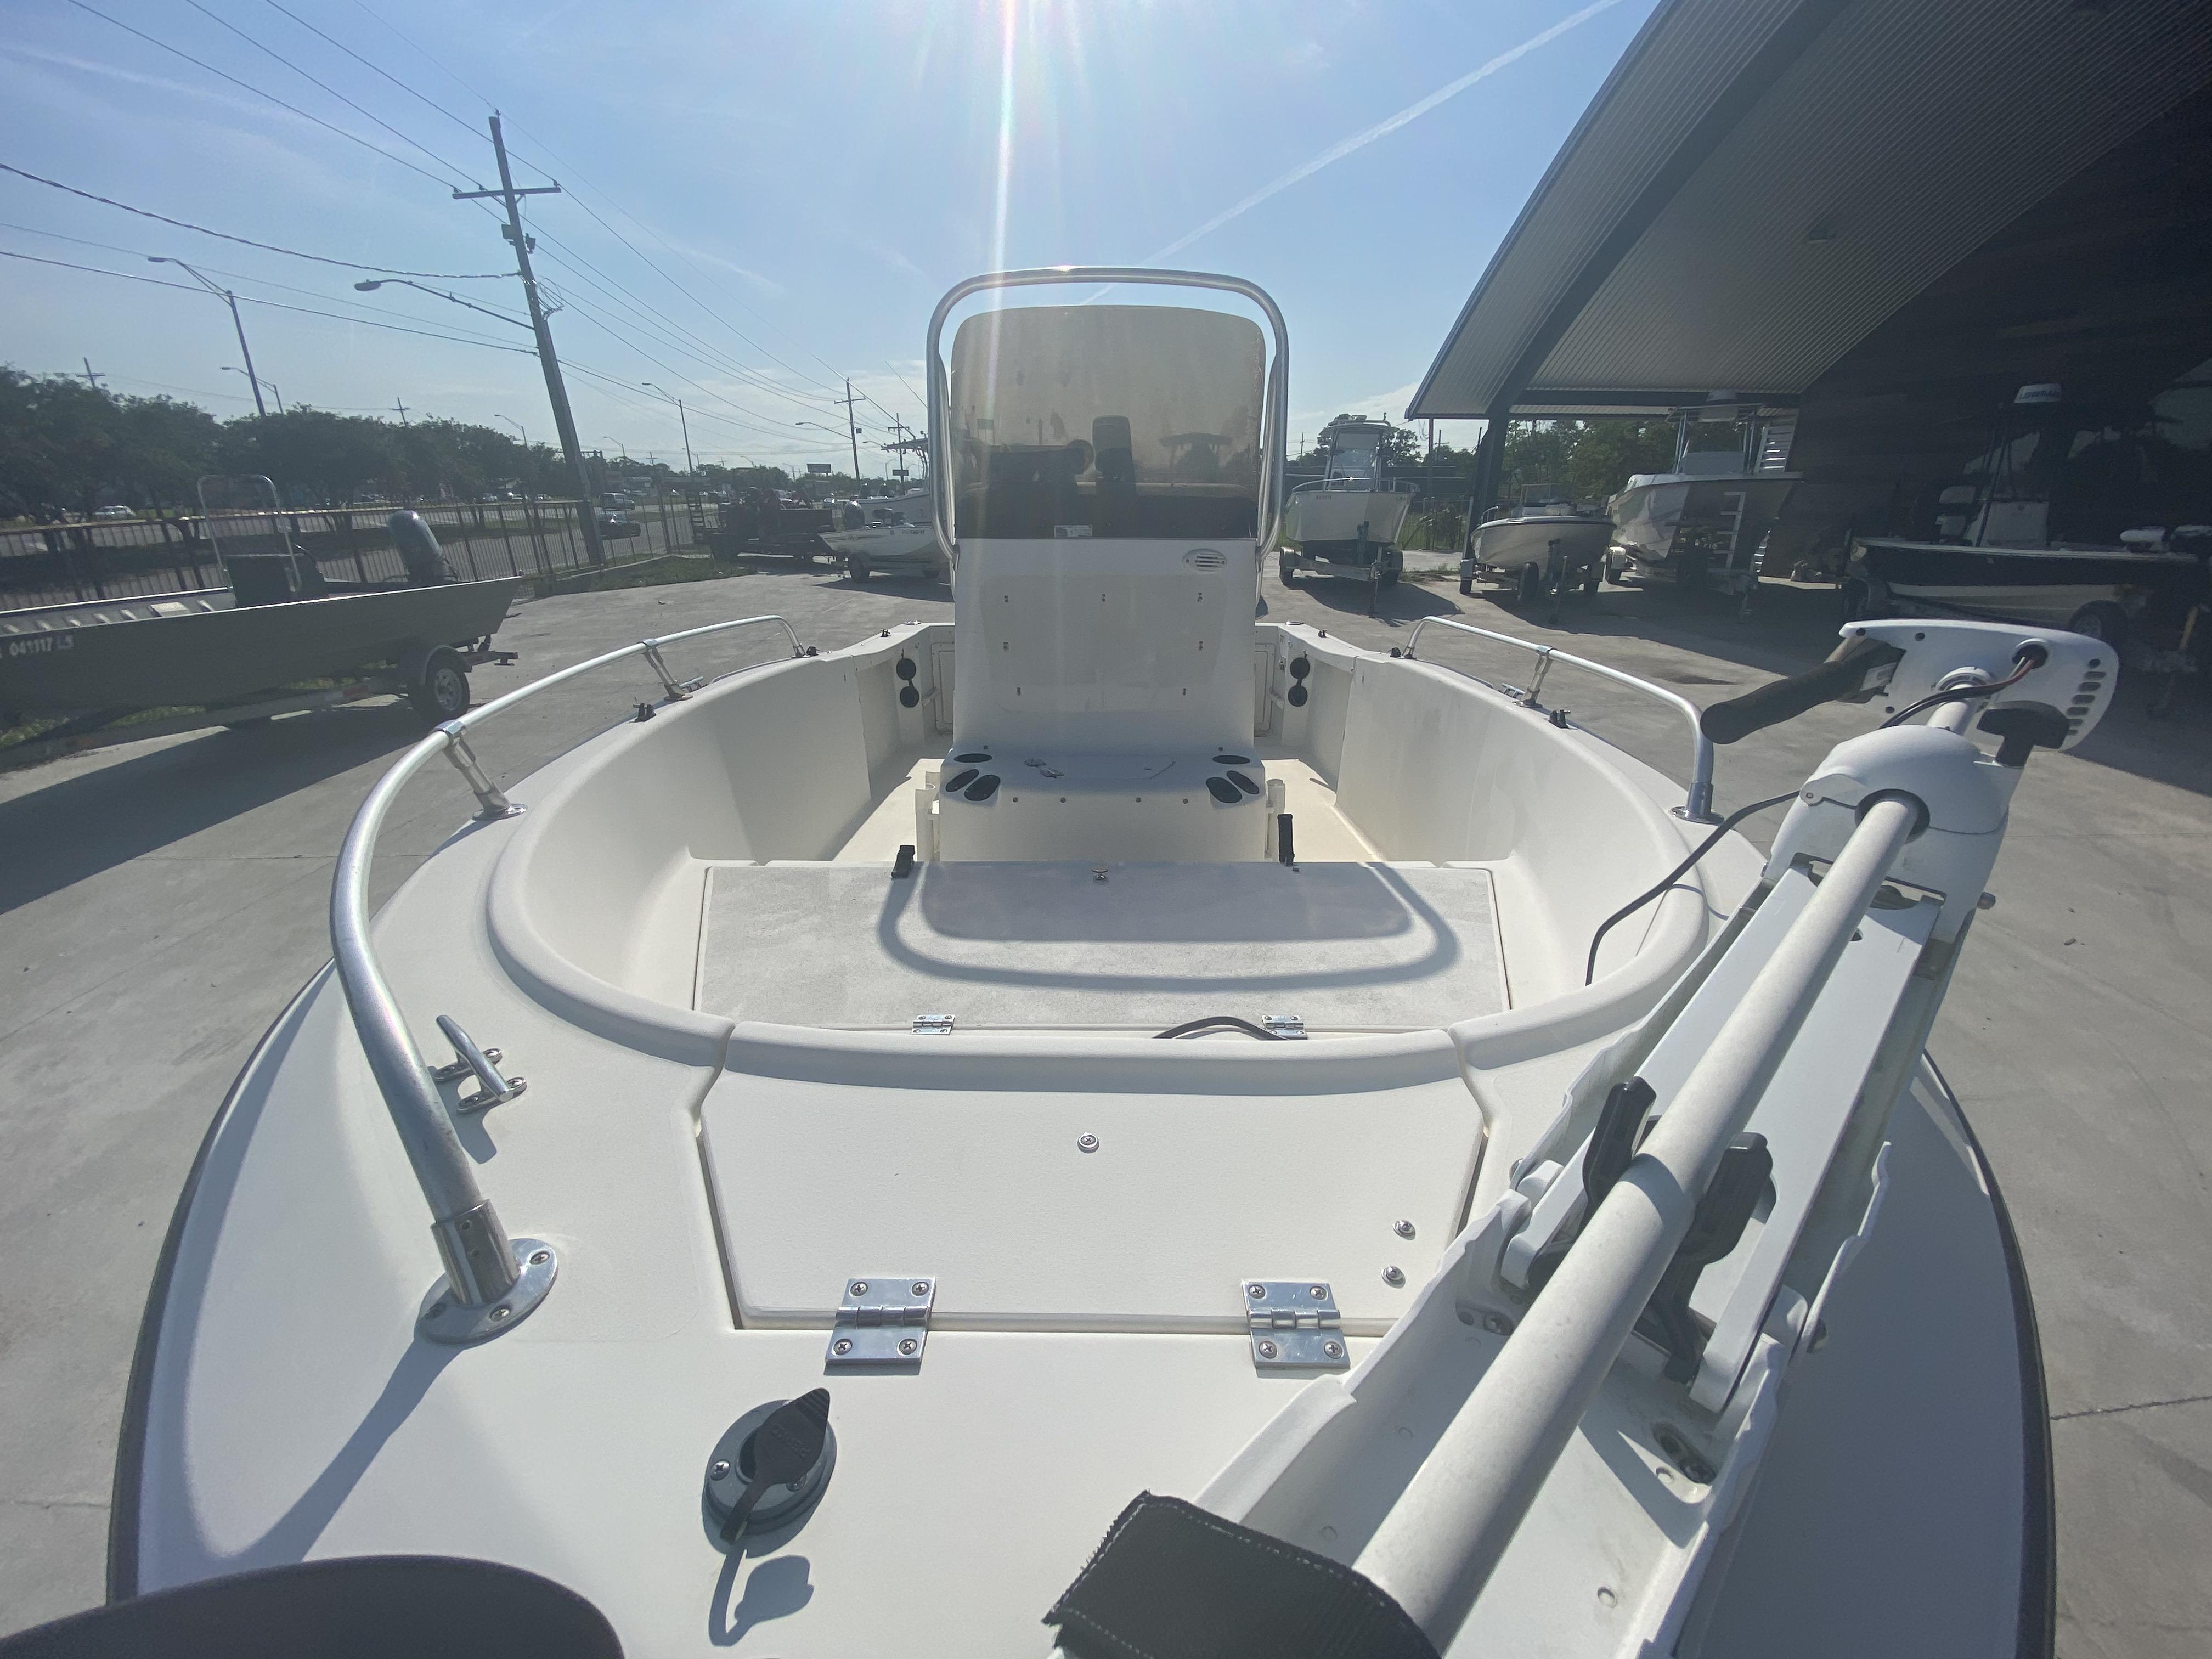 2004 Seaswirl boat for sale, model of the boat is 186 Striper & Image # 3 of 12